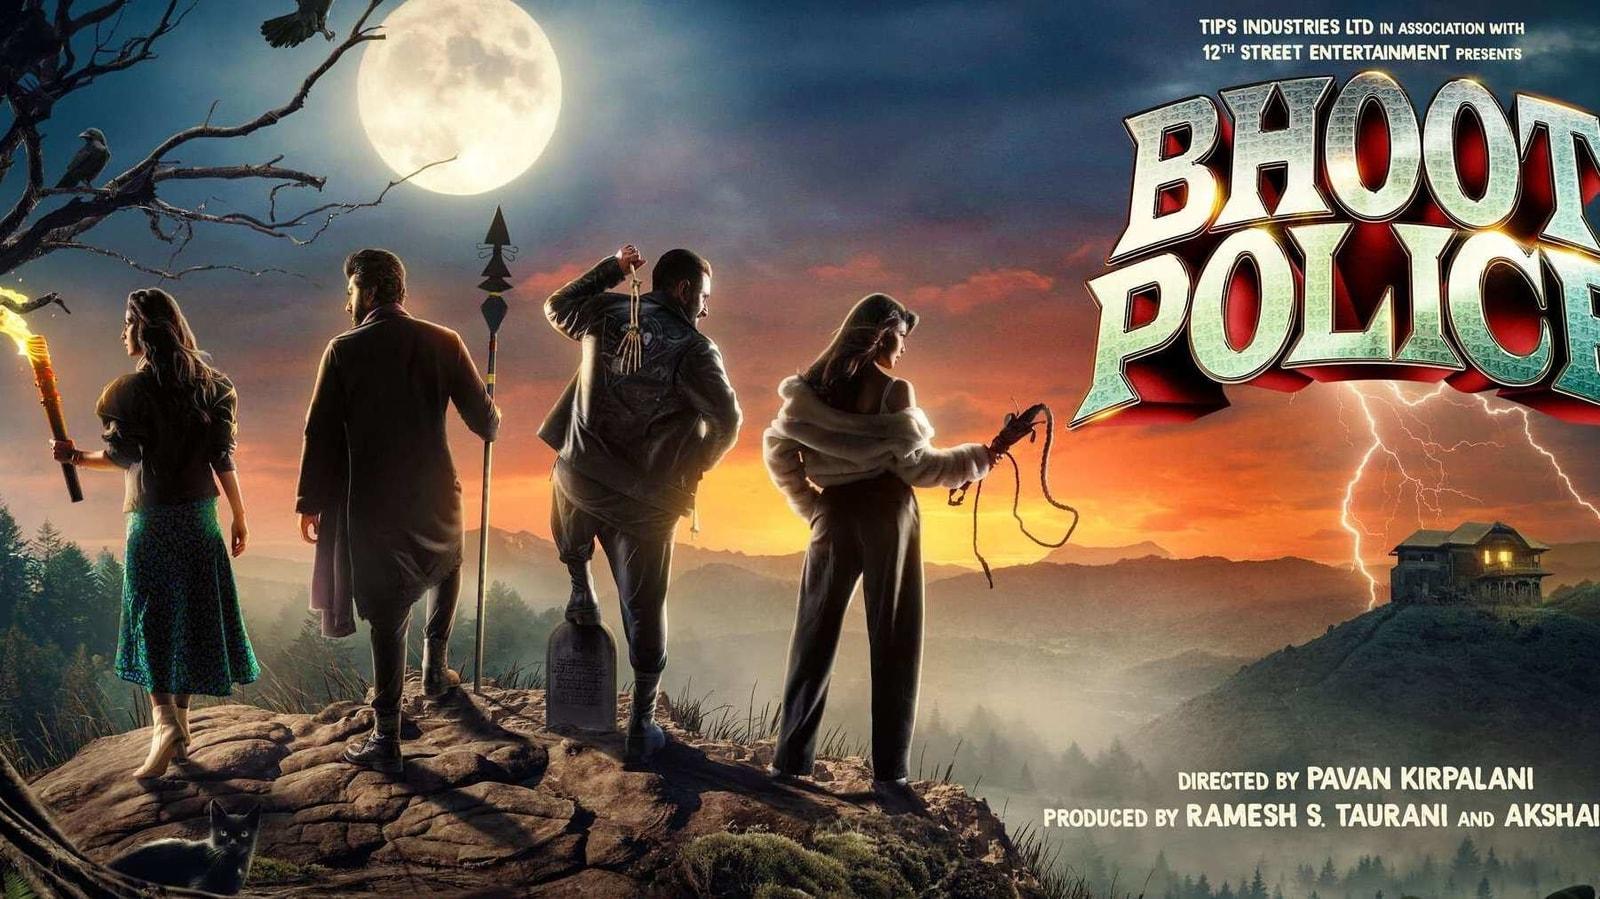 Bhoot Police poster: Saif Ali Khan, Arjun Kapoor, Yami Gautam, Jacqueline  Fernandez gear up to hunt down ghosts | Hindustan Times